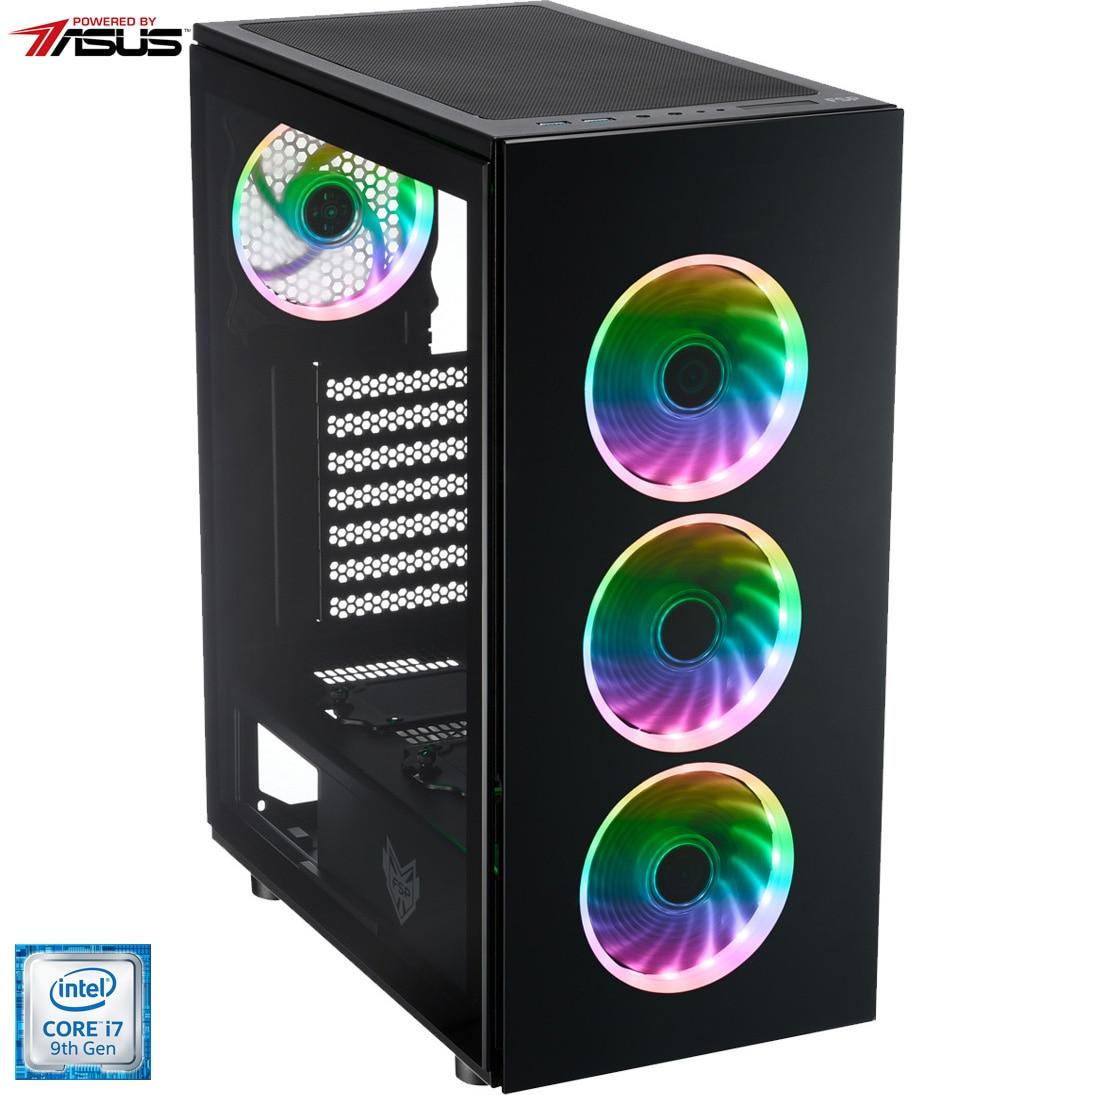 Fotografie Sistem Desktop Gaming Serioux Powered by ASUS cu procesor Intel® Core™ i7-9700 pana la 4.70GHz, 16GB DDR4, 2TB HDD, 512GB SSD M.2 PCIe, GeForce® GTX 1660 Ti 6GB GDDR6